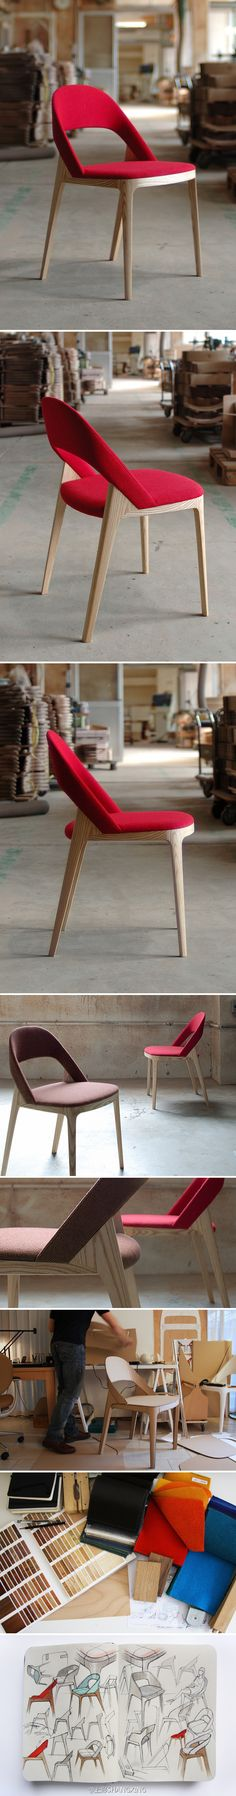 Clamp Chair | http://www.andreaskowalewski.com/ #pin_it #design @mundodascasas See more here: www.mundodascasas.com.br